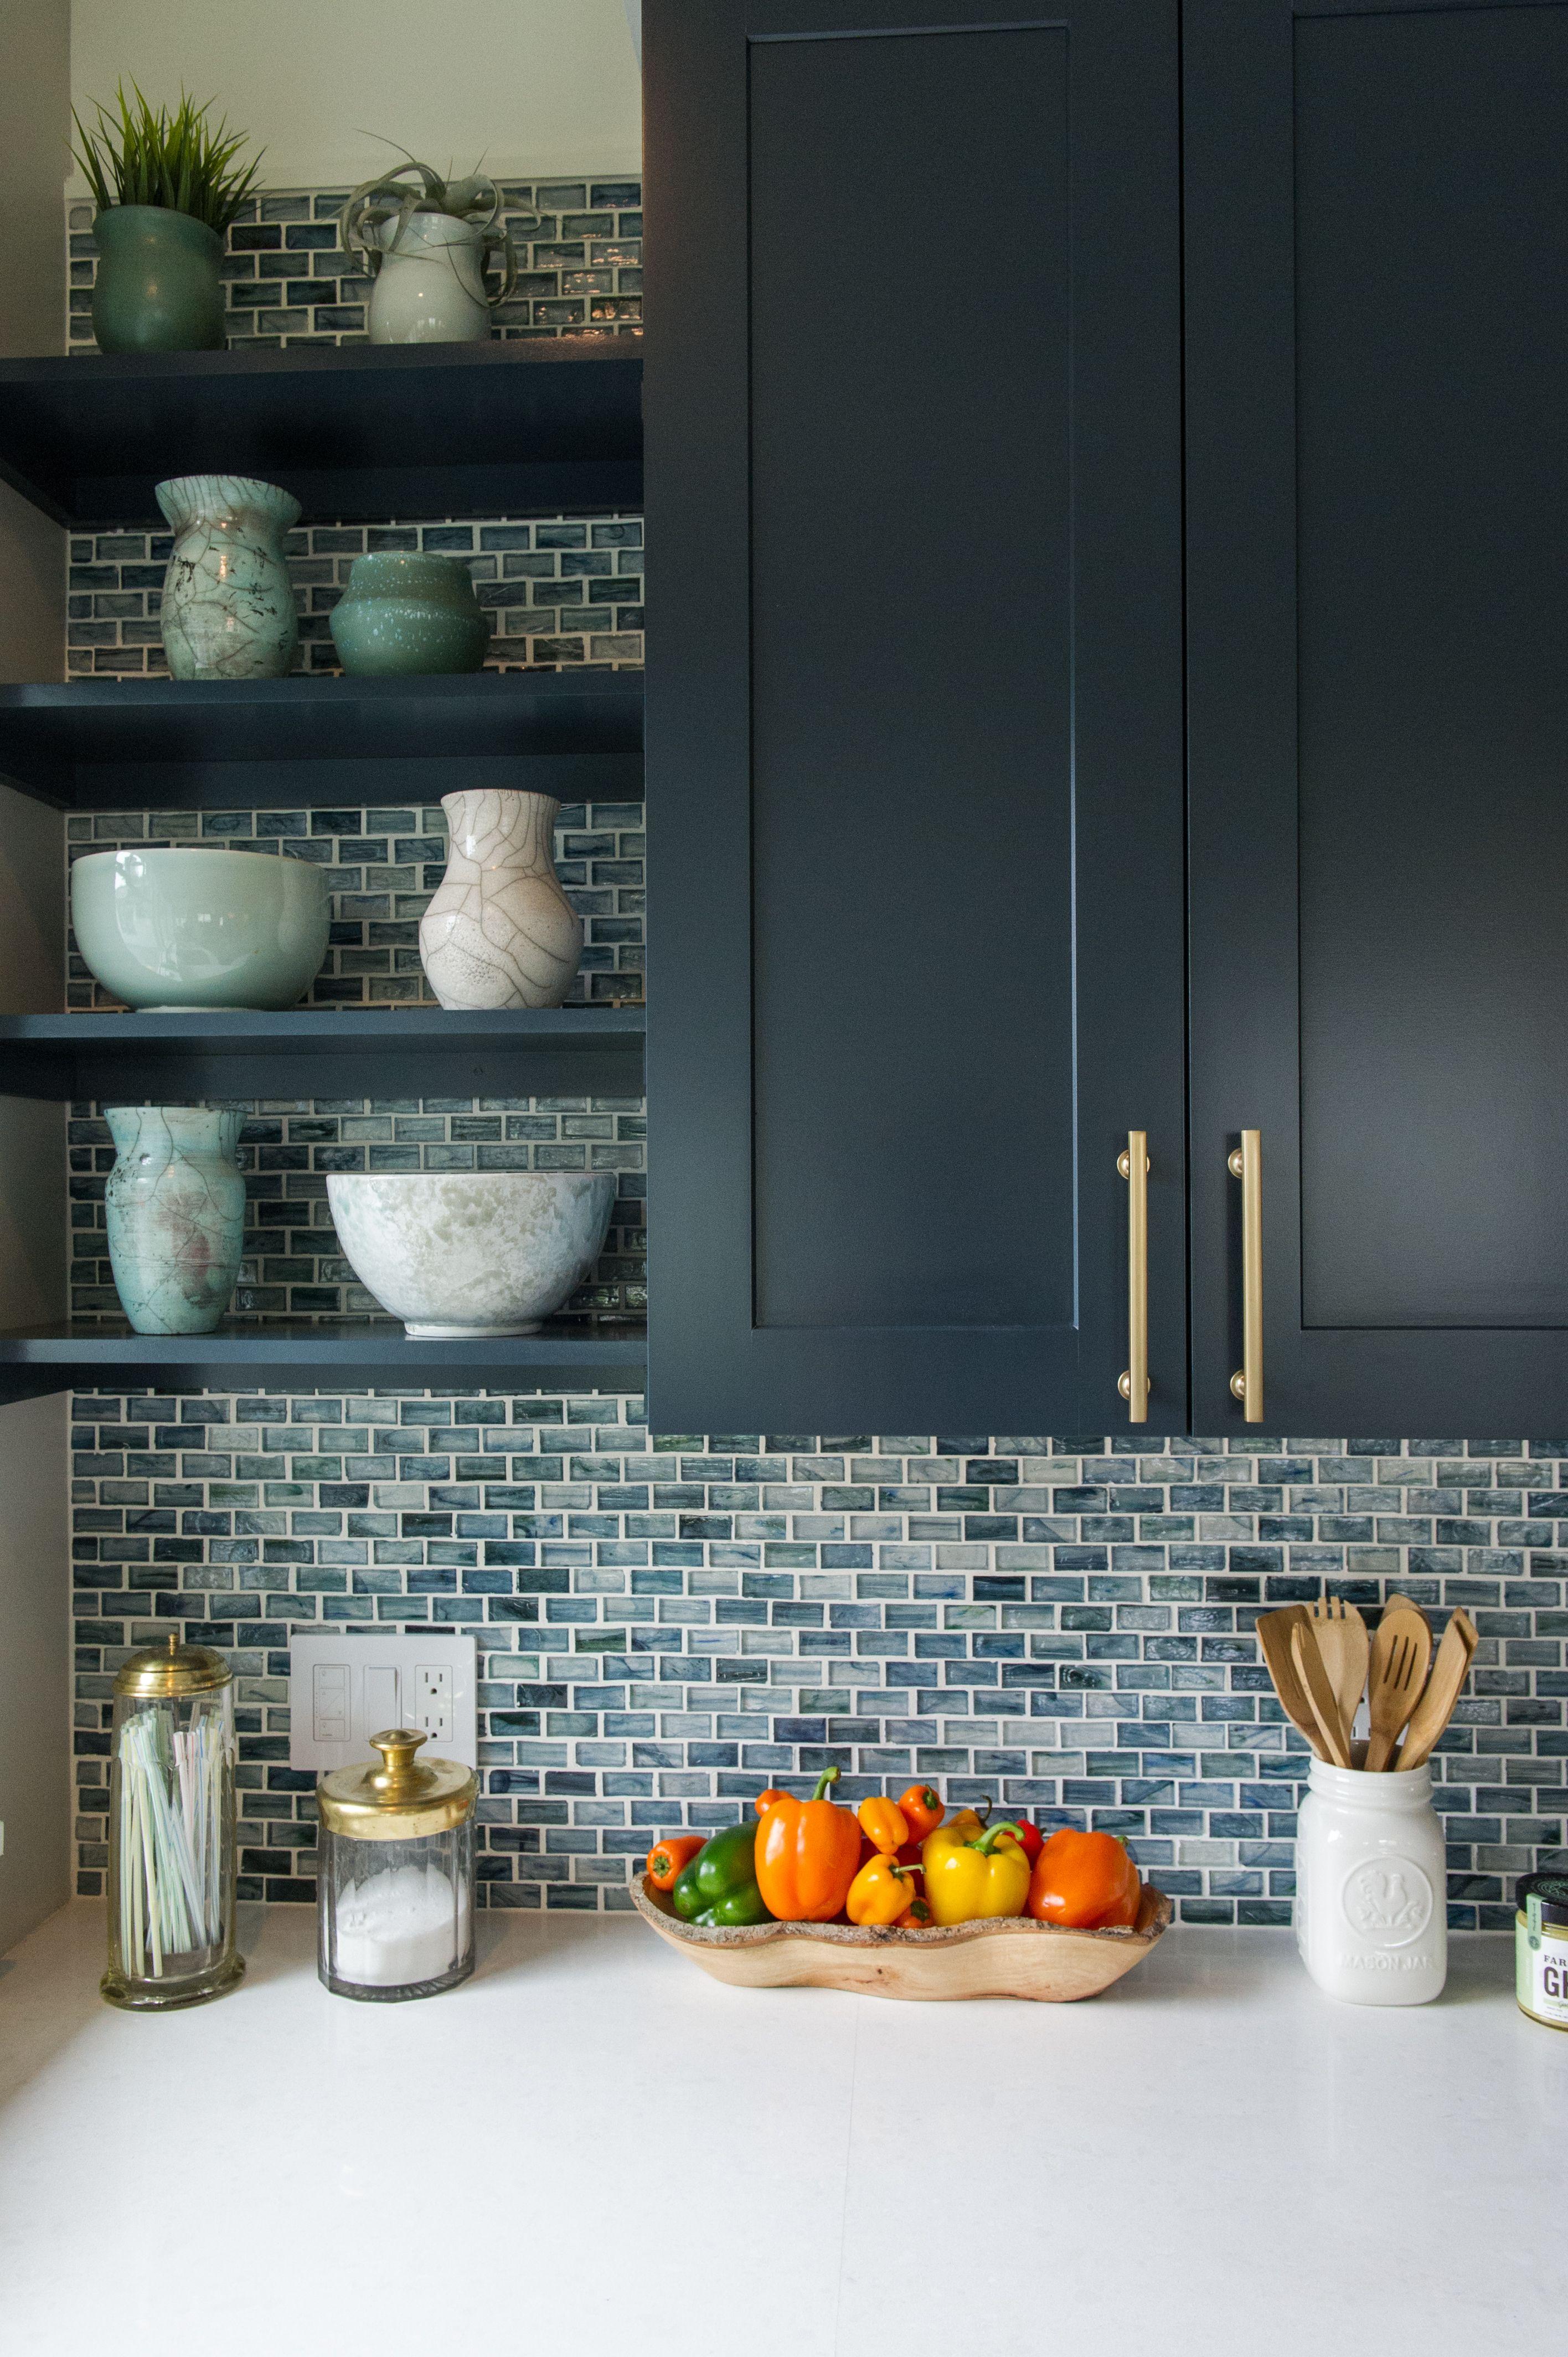 Rhode island beach house diamond cabinets ceiling and mosaics